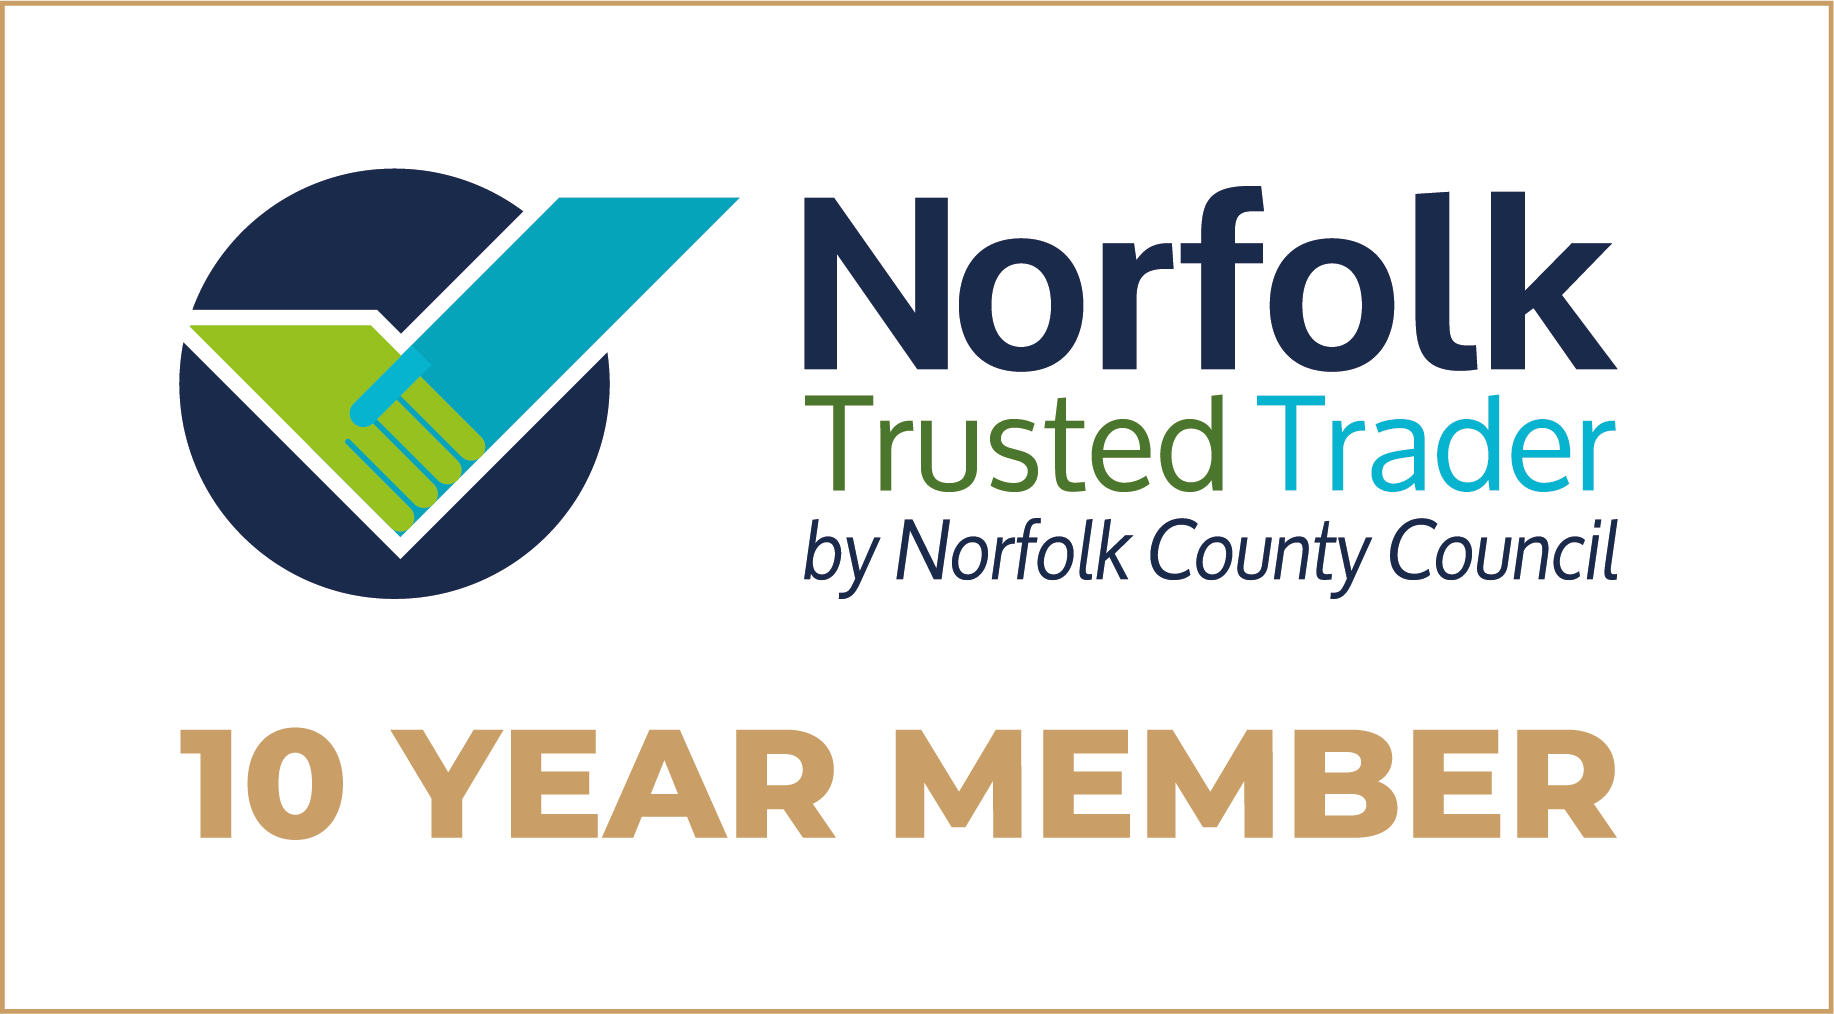 Norfolk Trusted Trader